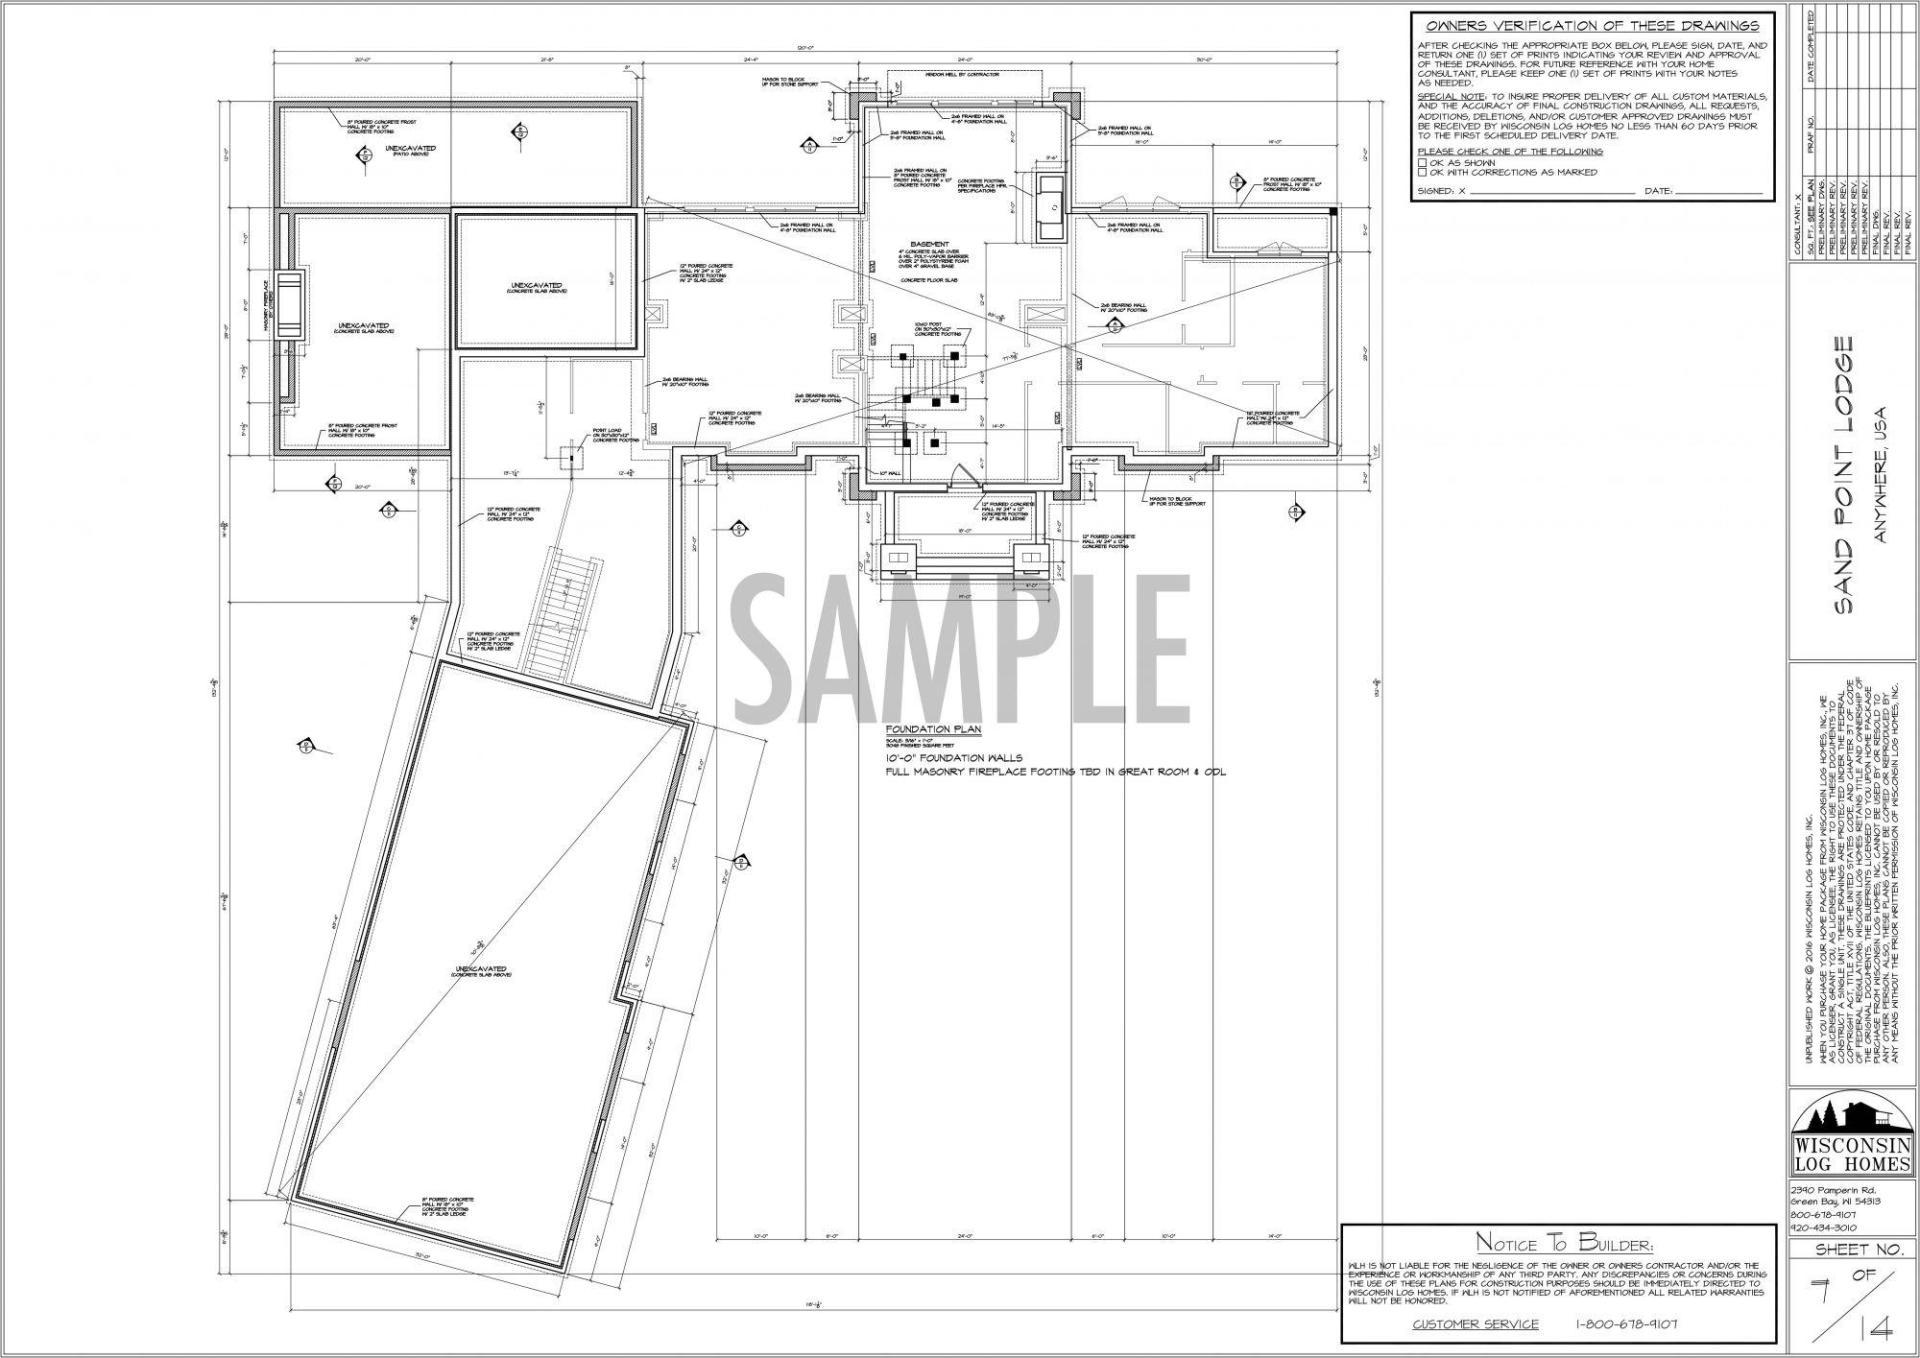 National Log Home Design & Build Services for Custom Log